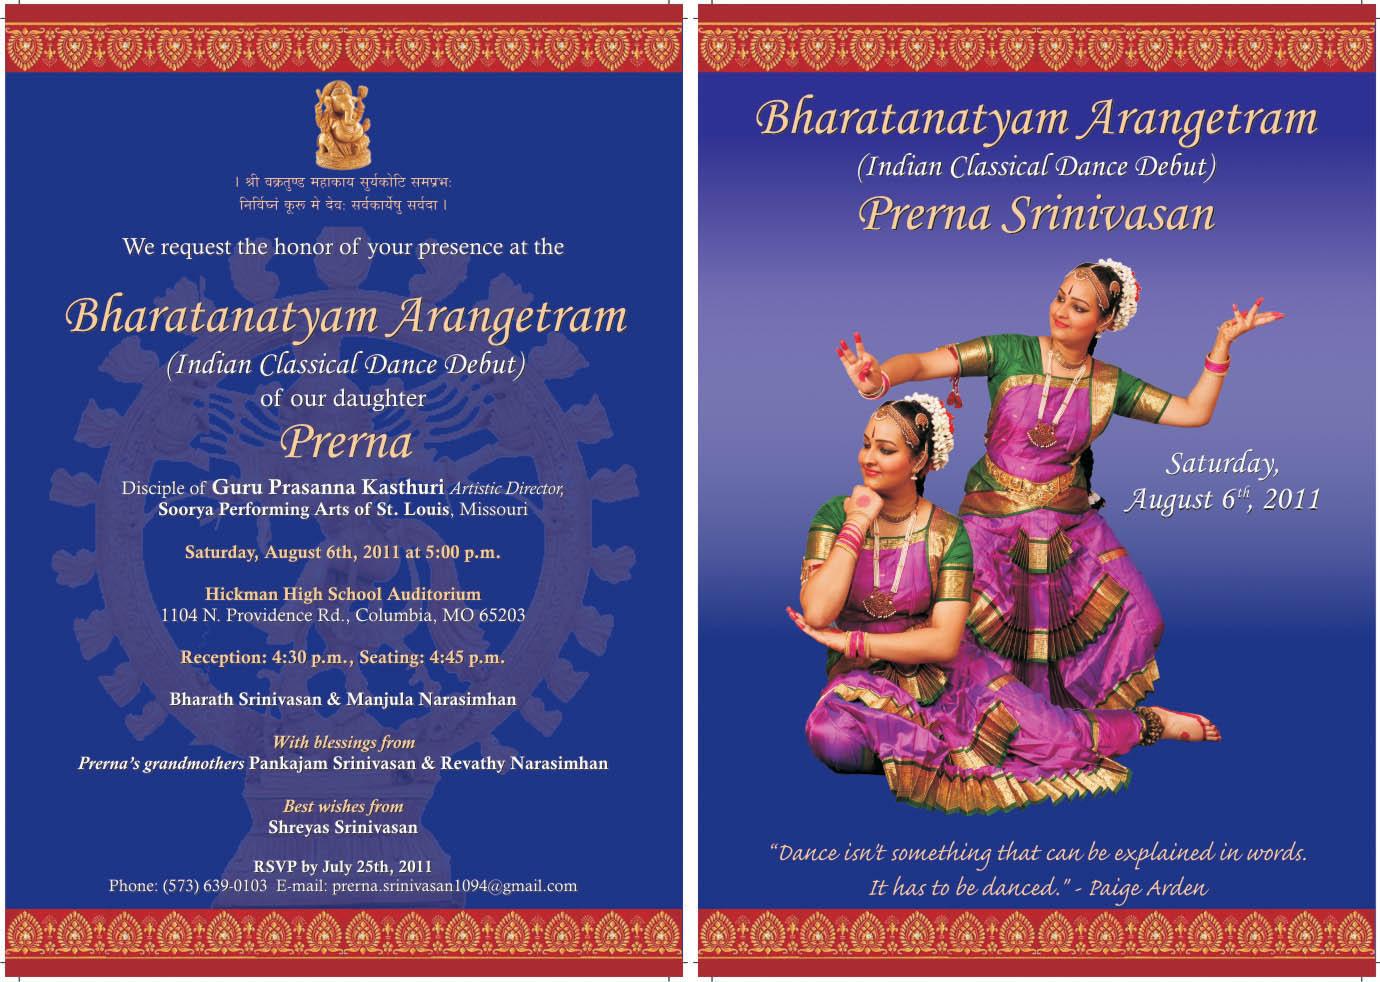 bharatanatyam arangetram invitation wording Inviviewco